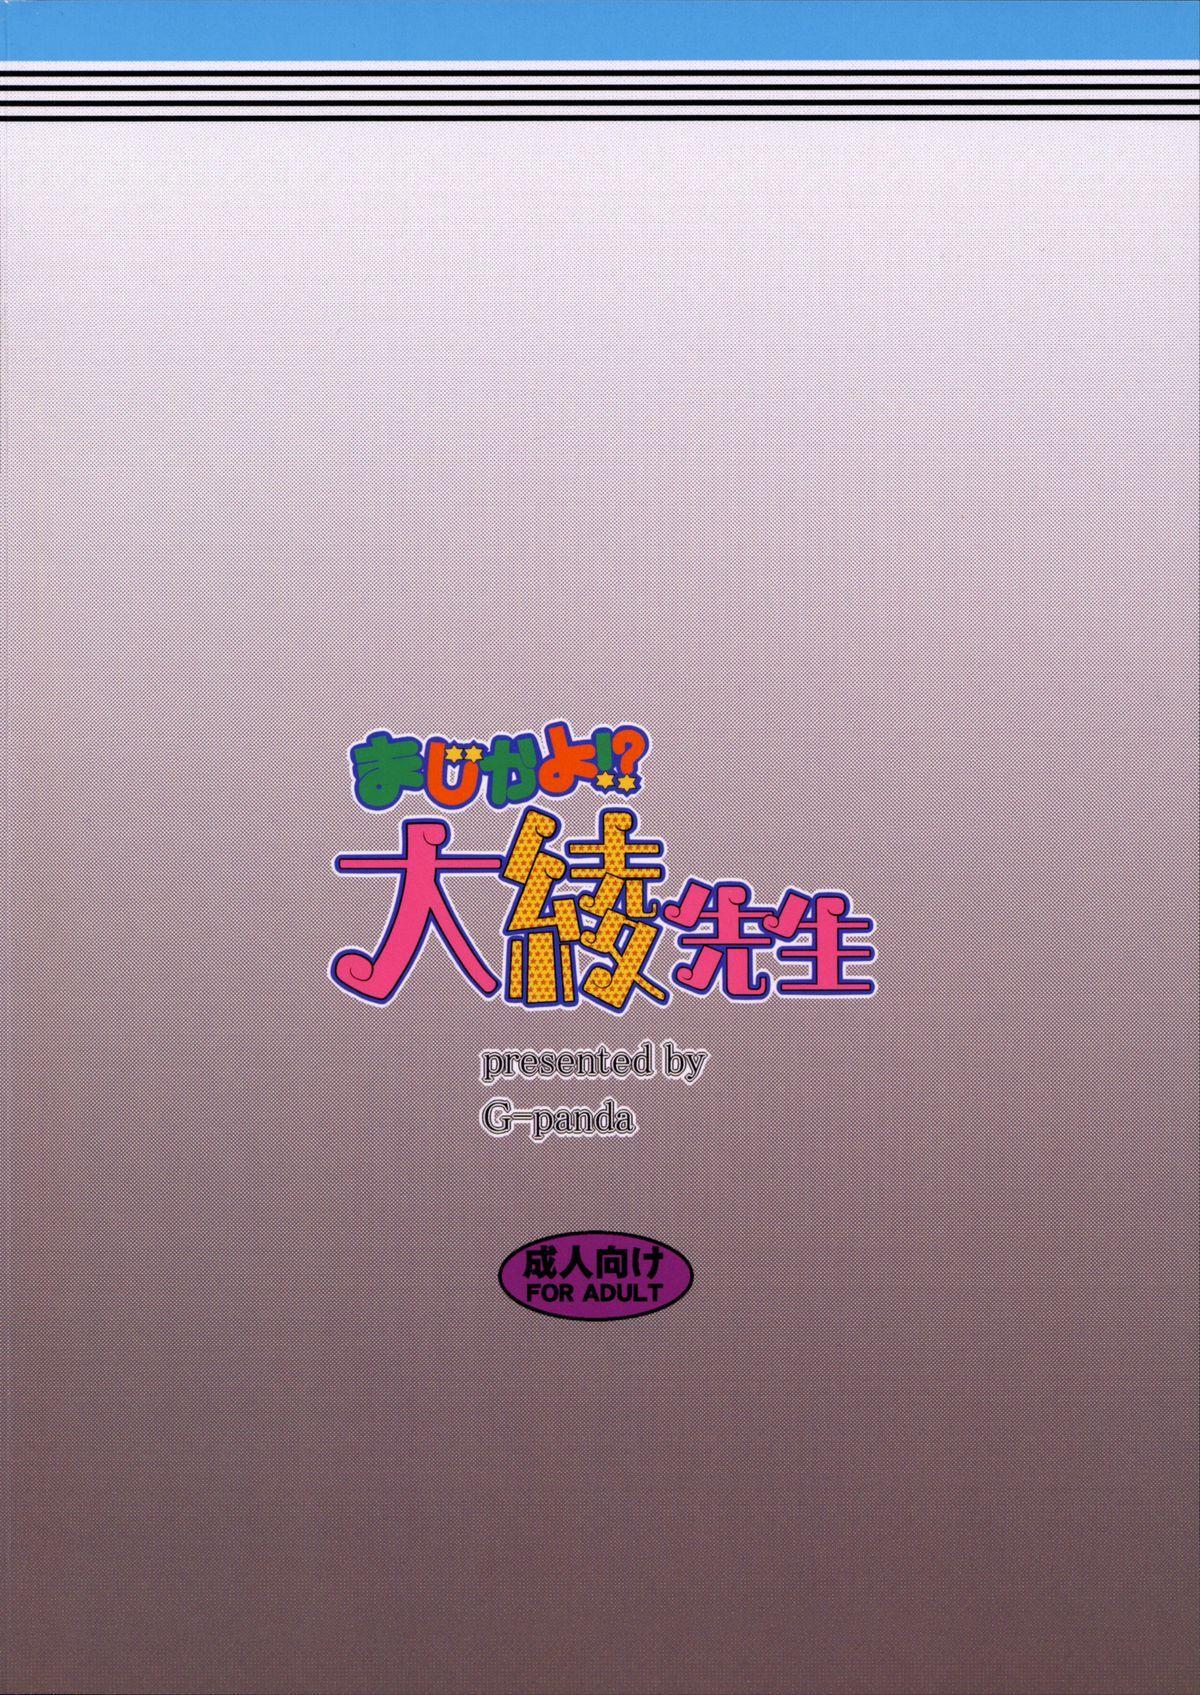 (COMIC1☆8) [G-panda (Midoh Tsukasa)] Maji kayo!? Ooaya-sensei   I Can't Believe It! Ooaya-sensei (Magical Taruruuto-kun) [English] {doujin-moe.us} 29